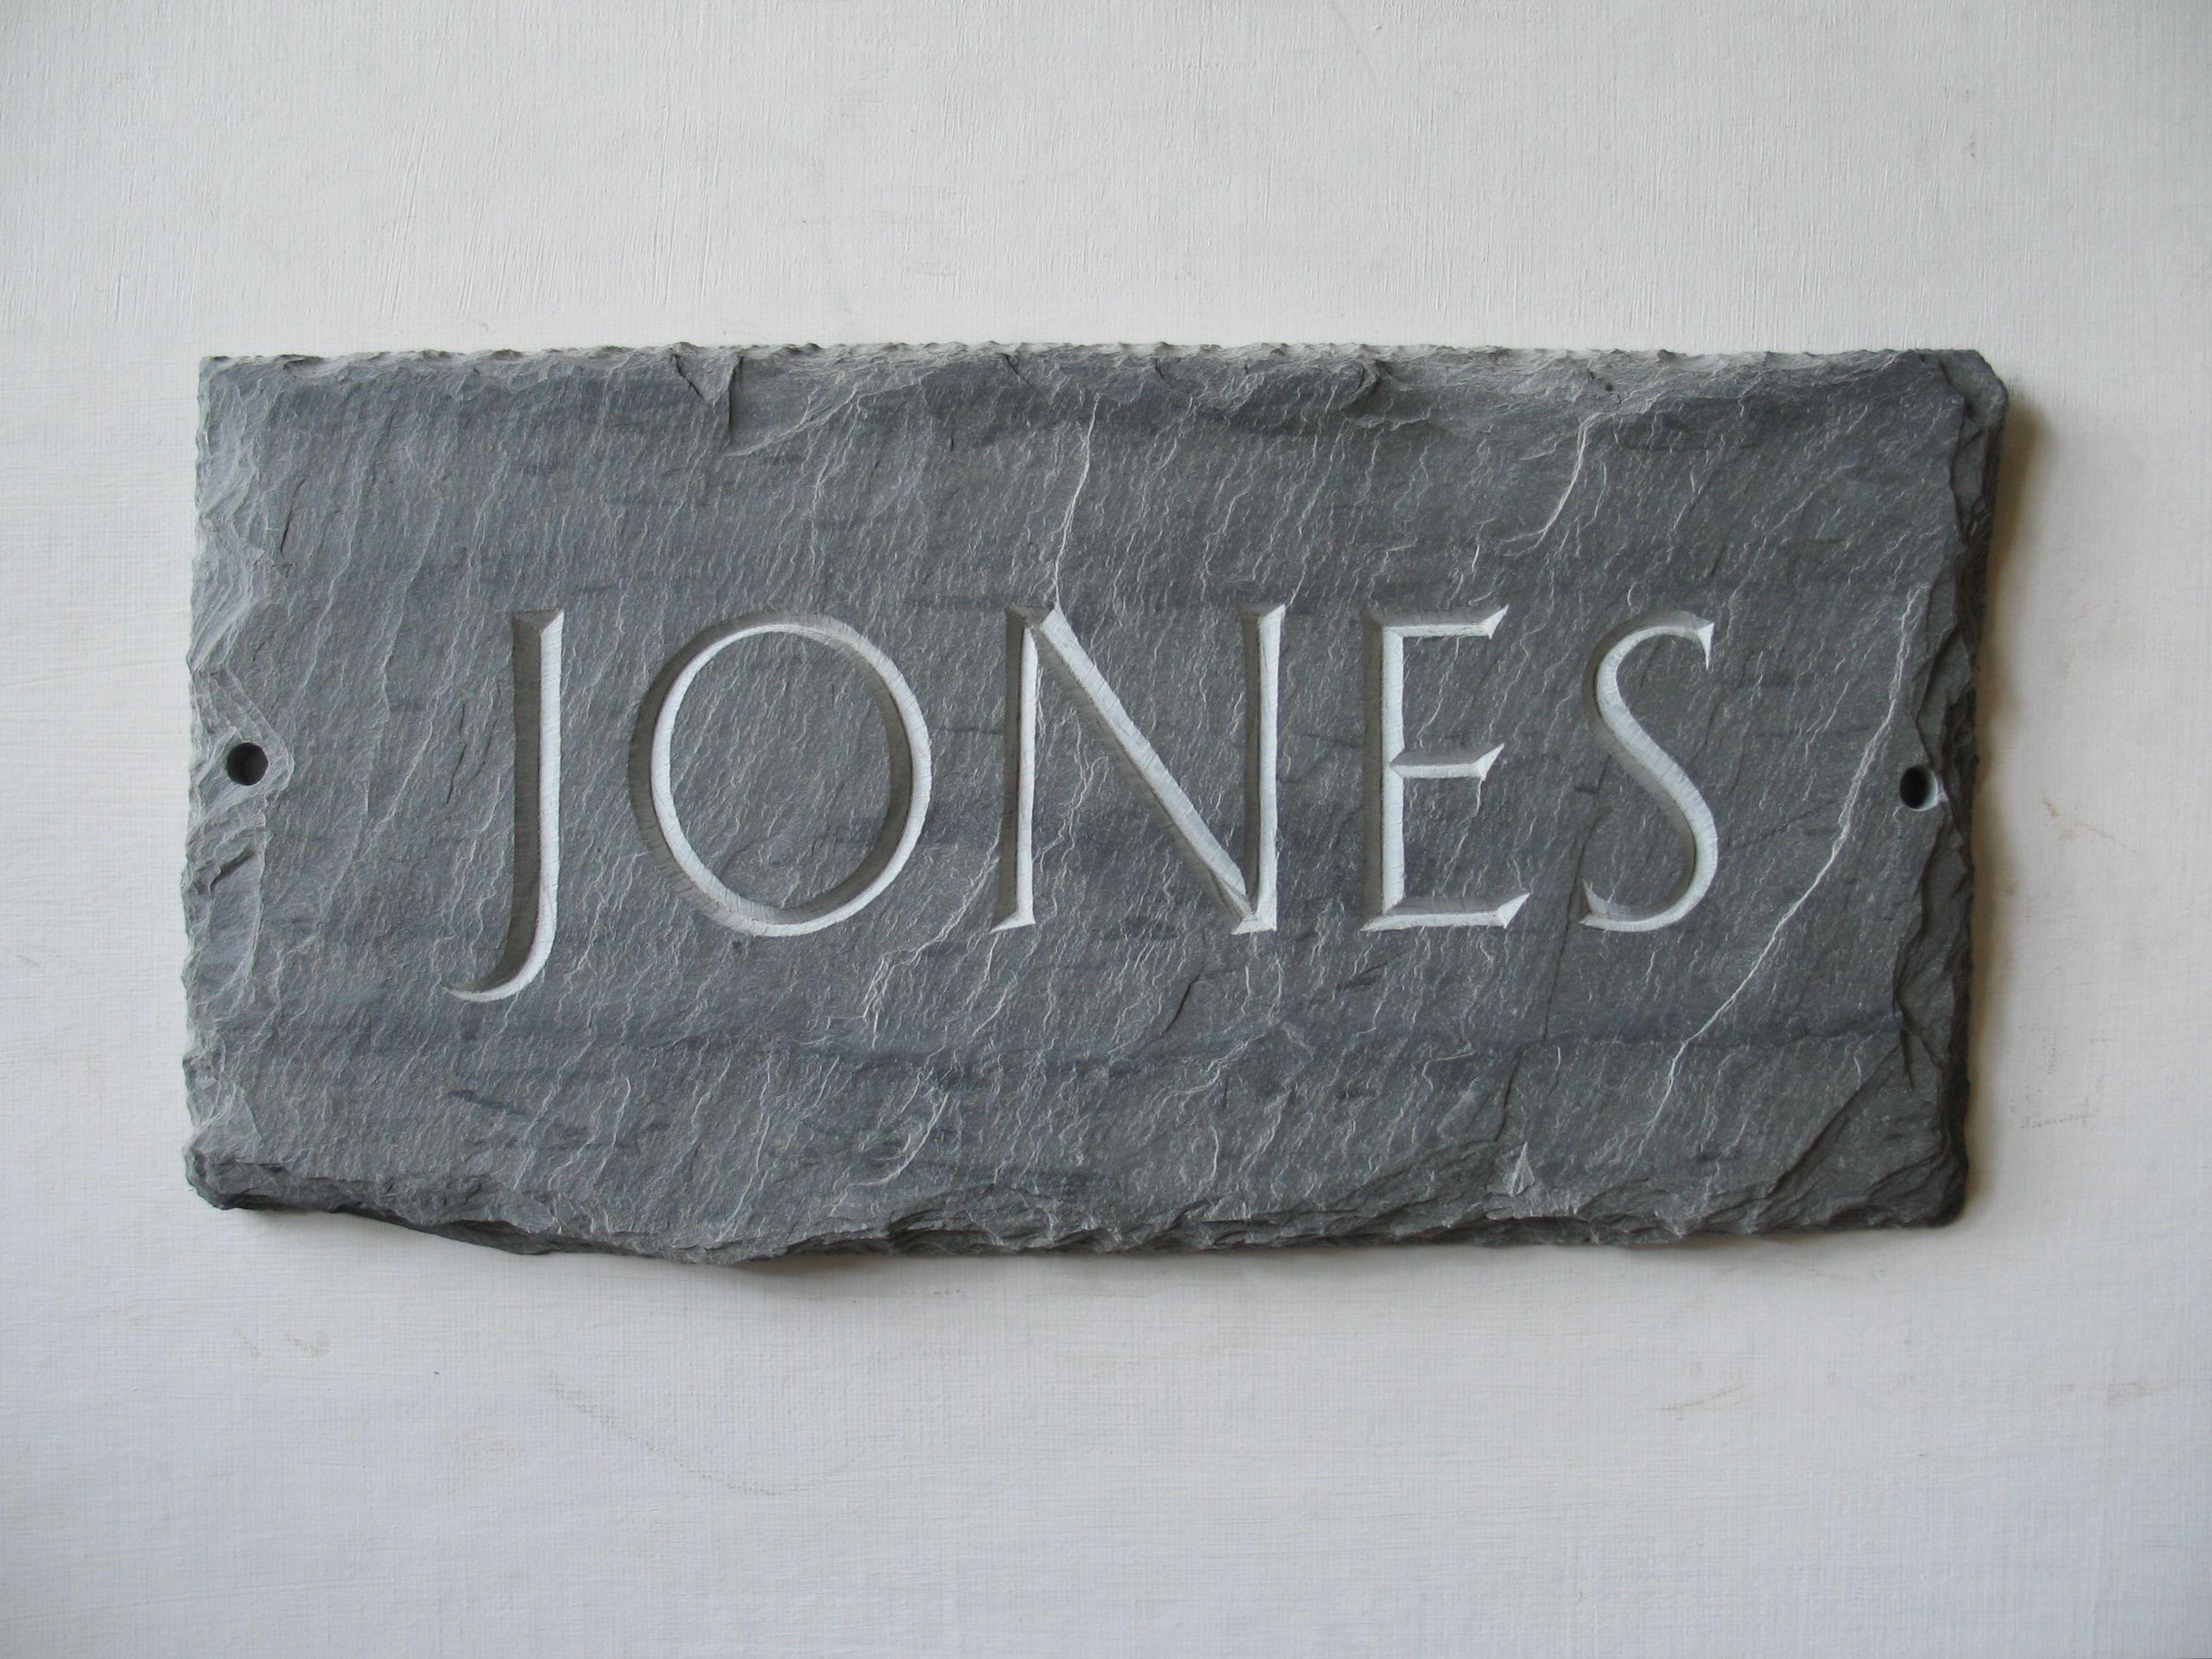 slate roof tile hand carved v cut name plaque for home outside or